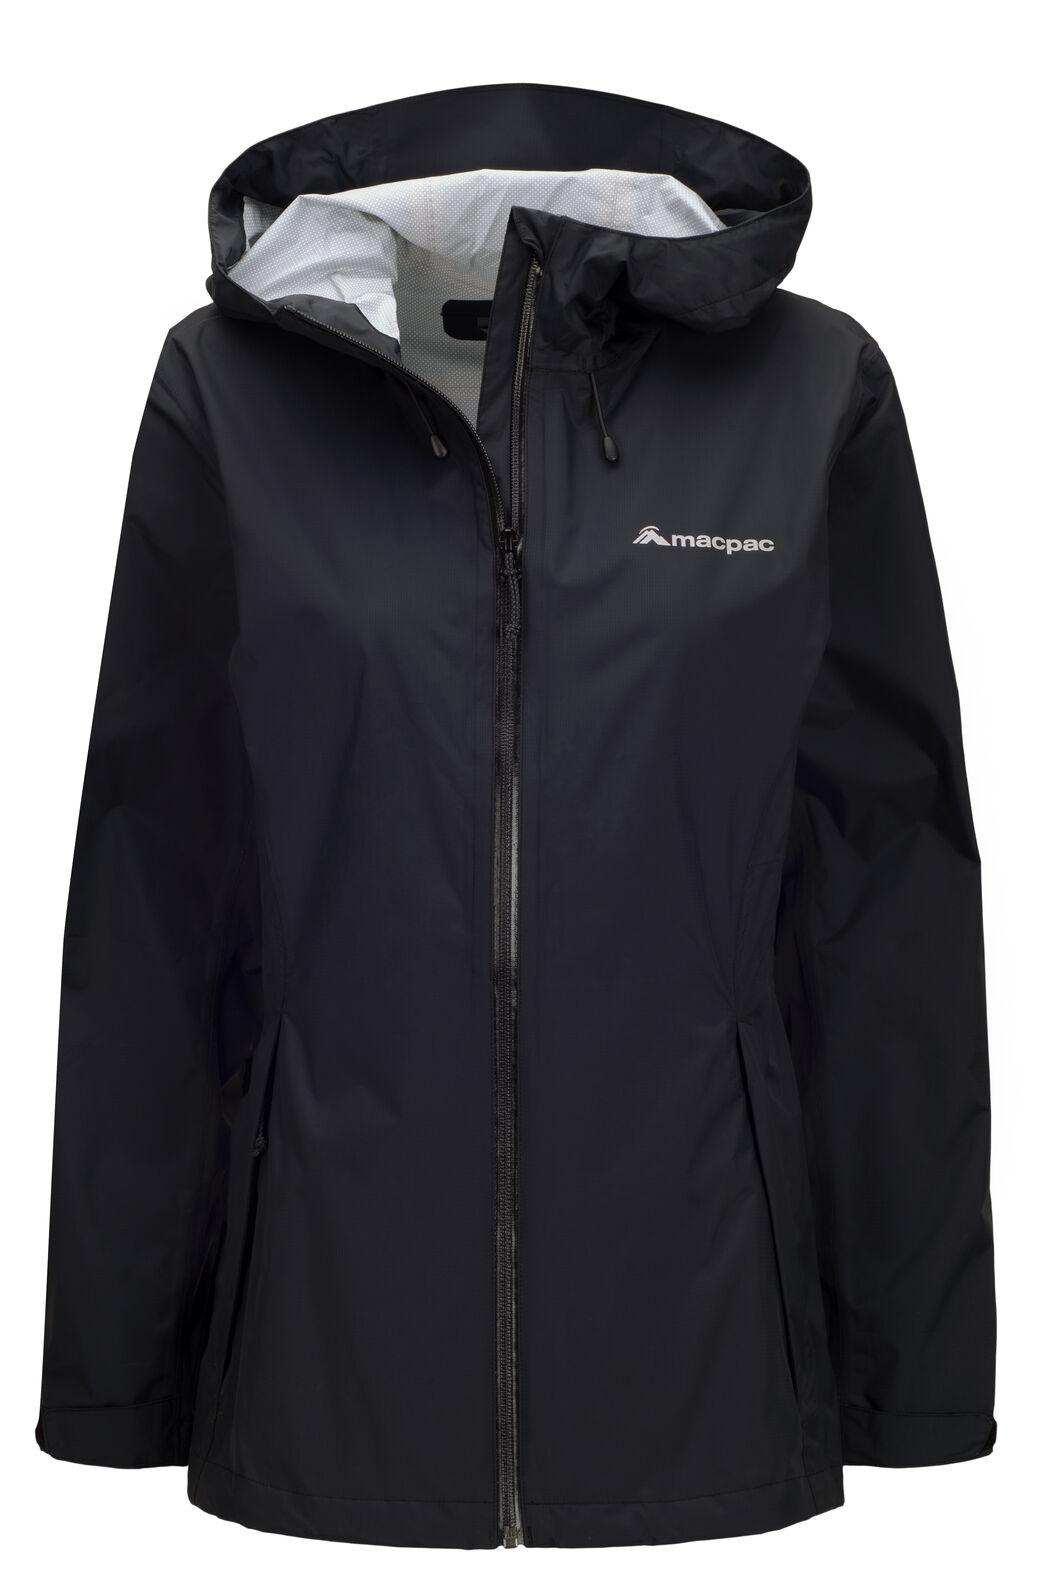 Macpac Women's Mistral Rain Jacket, Black, hi-res